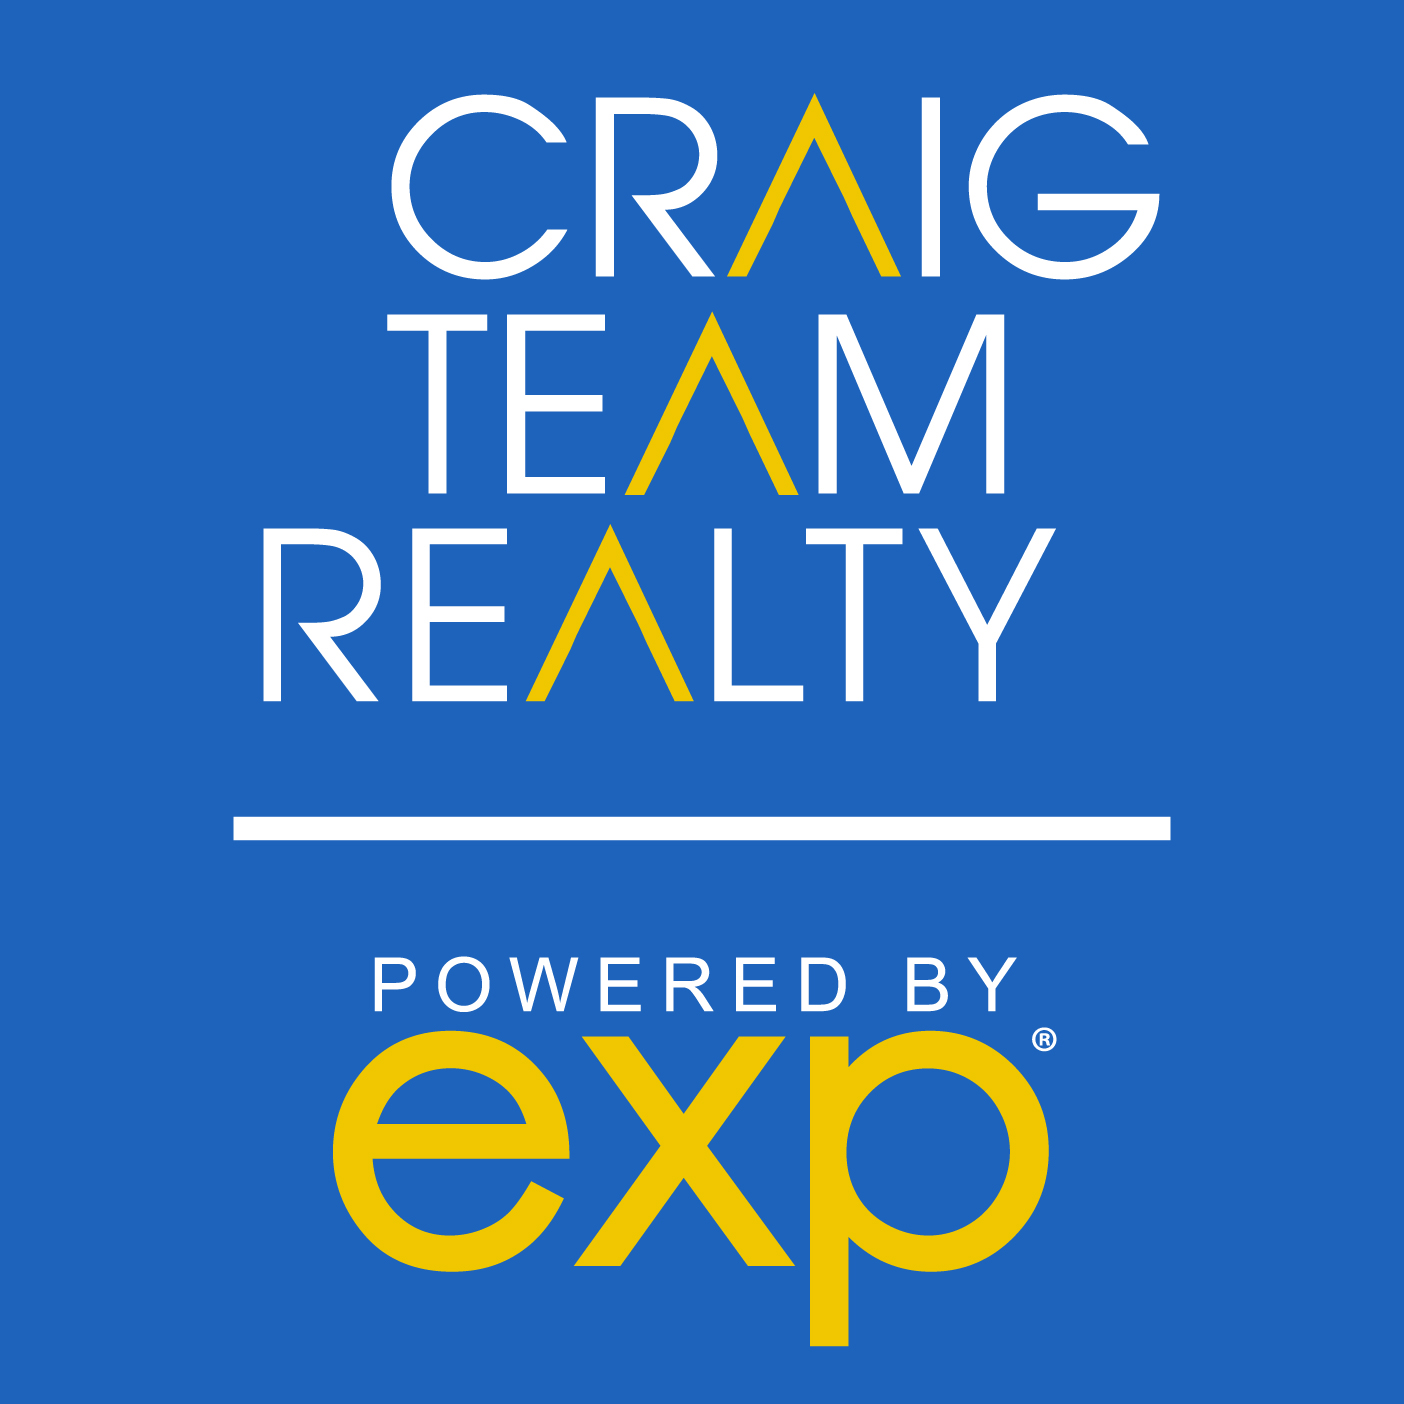 Craig Team Realty